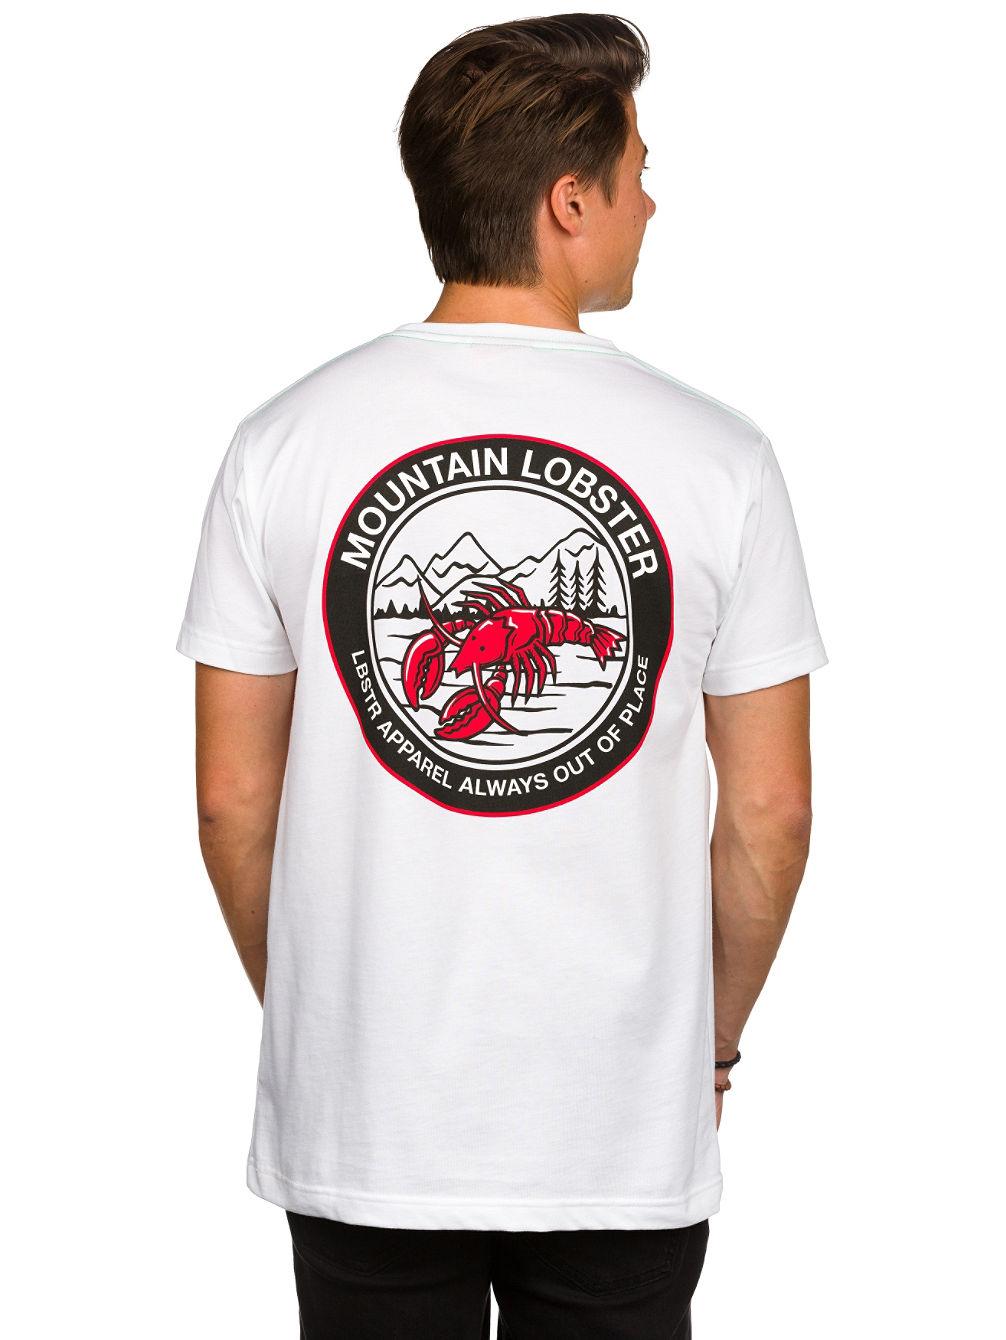 lbstr-apparel-always-t-shirt